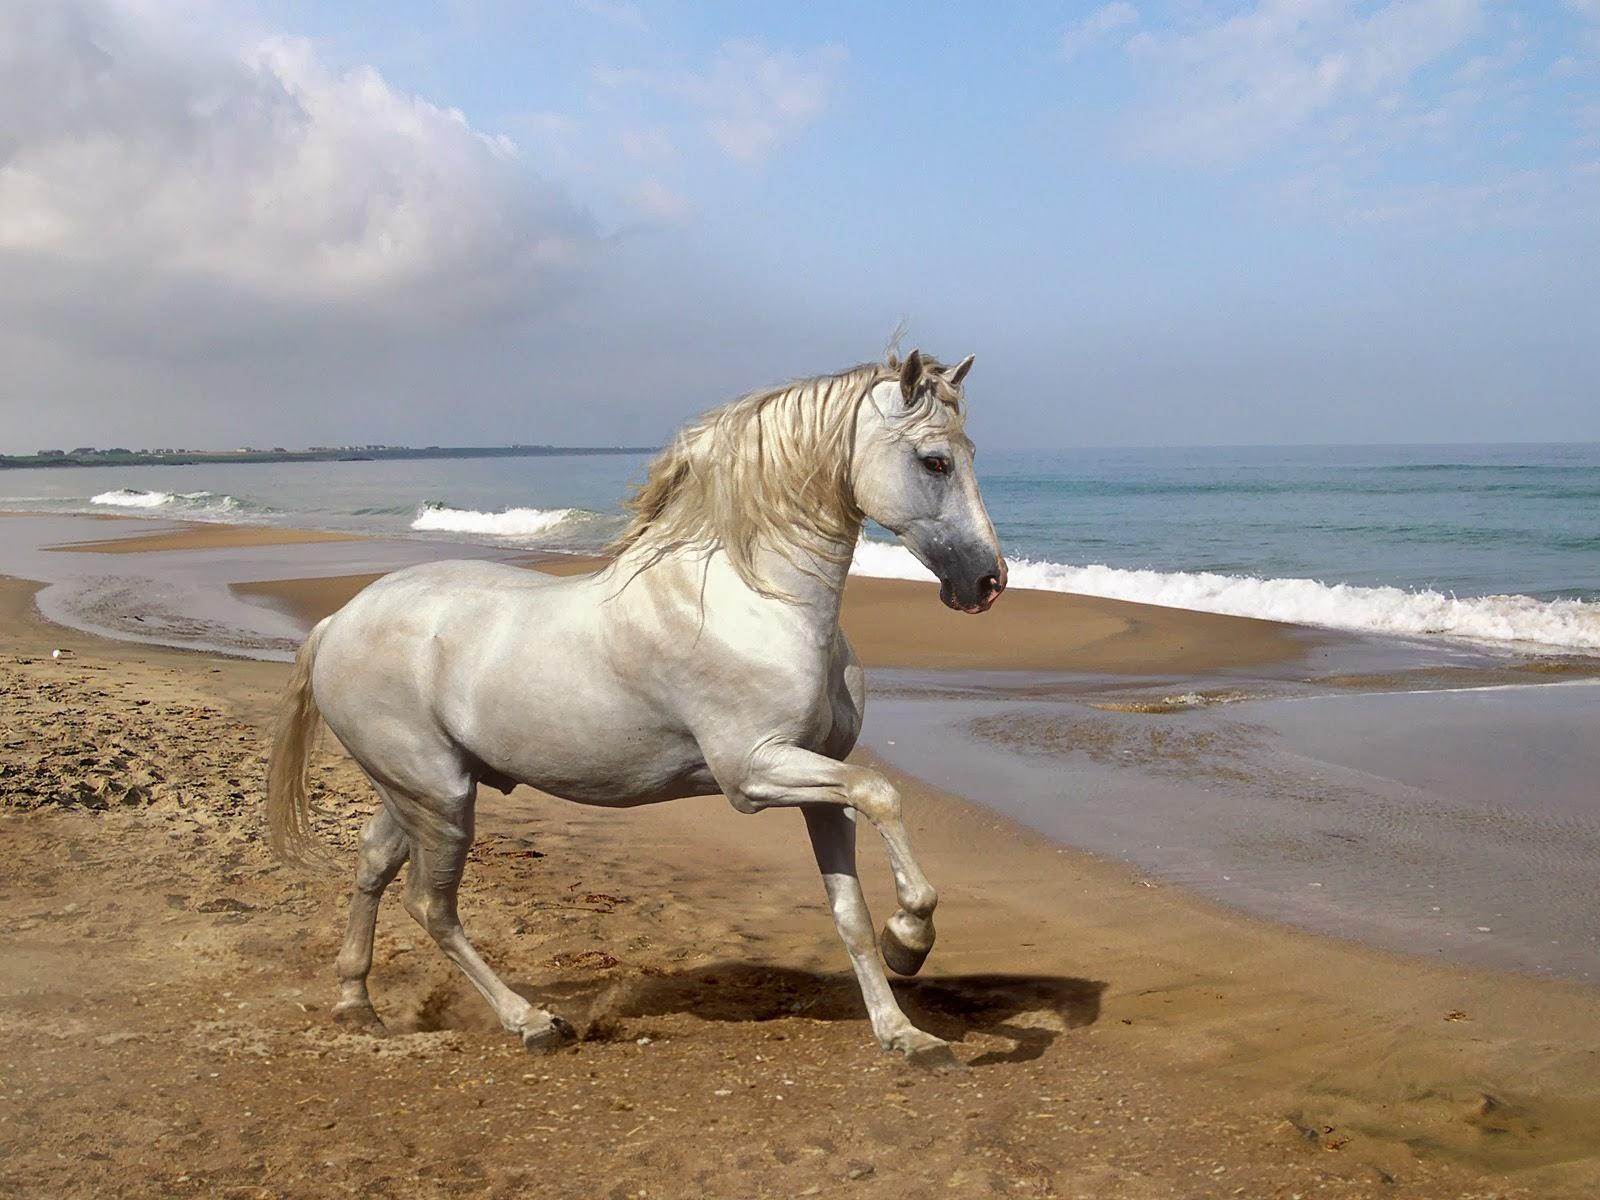 Most Inspiring   Wallpaper Horse Summer - Beautiful+Animal+Horse+Wallpapers+HD+%25286%2529  Gallery_974451.jpg